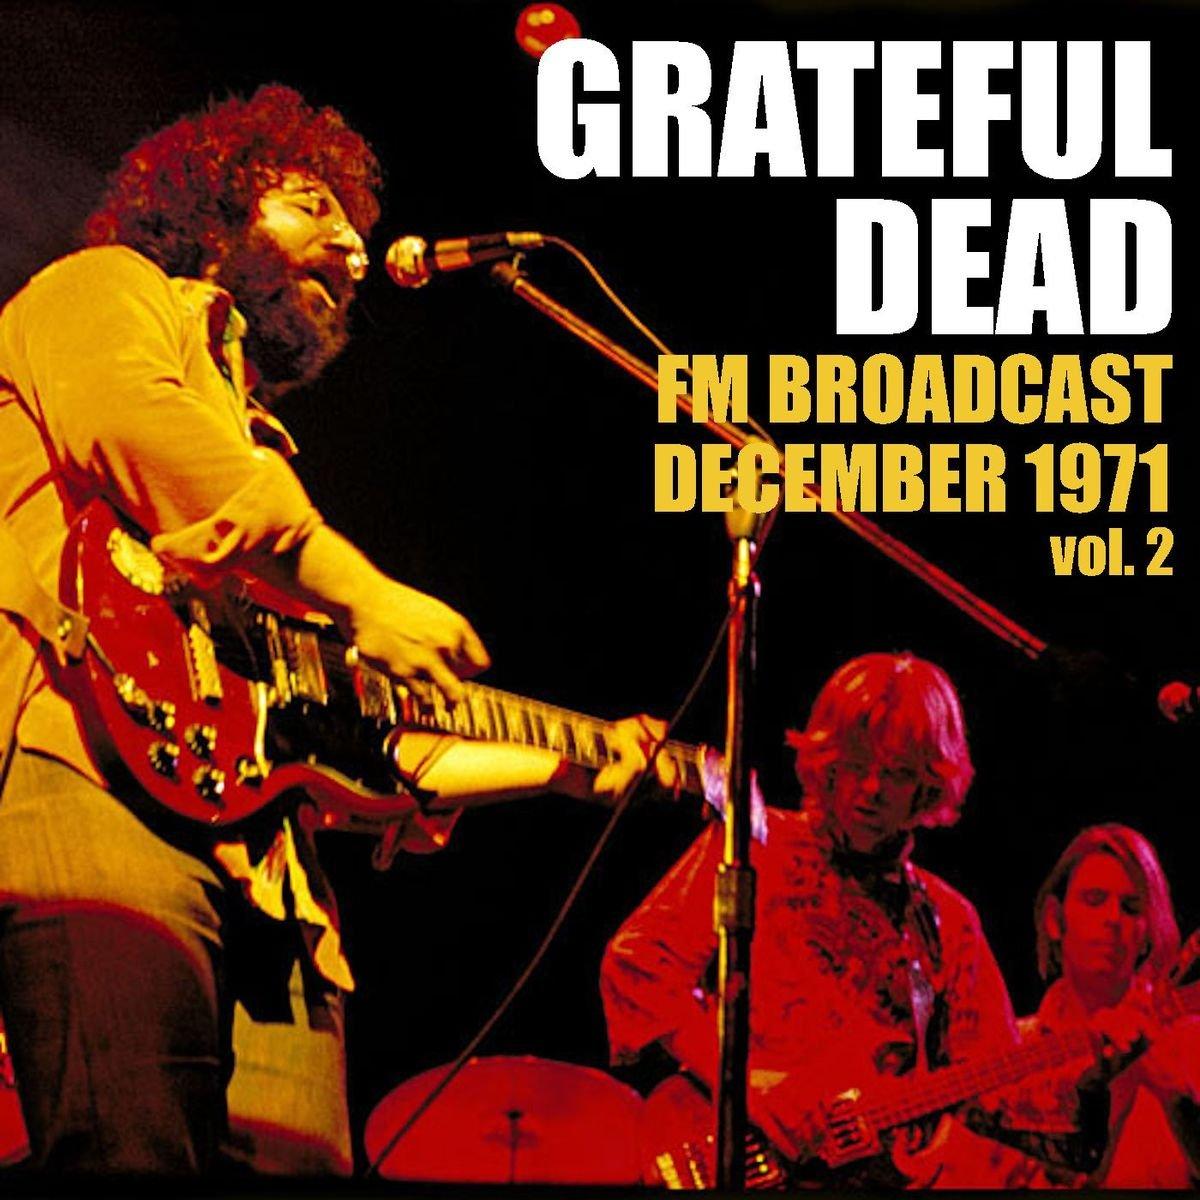 Grateful Dead - FM Broadcast December 1971 Vol. 2 (2020) CD